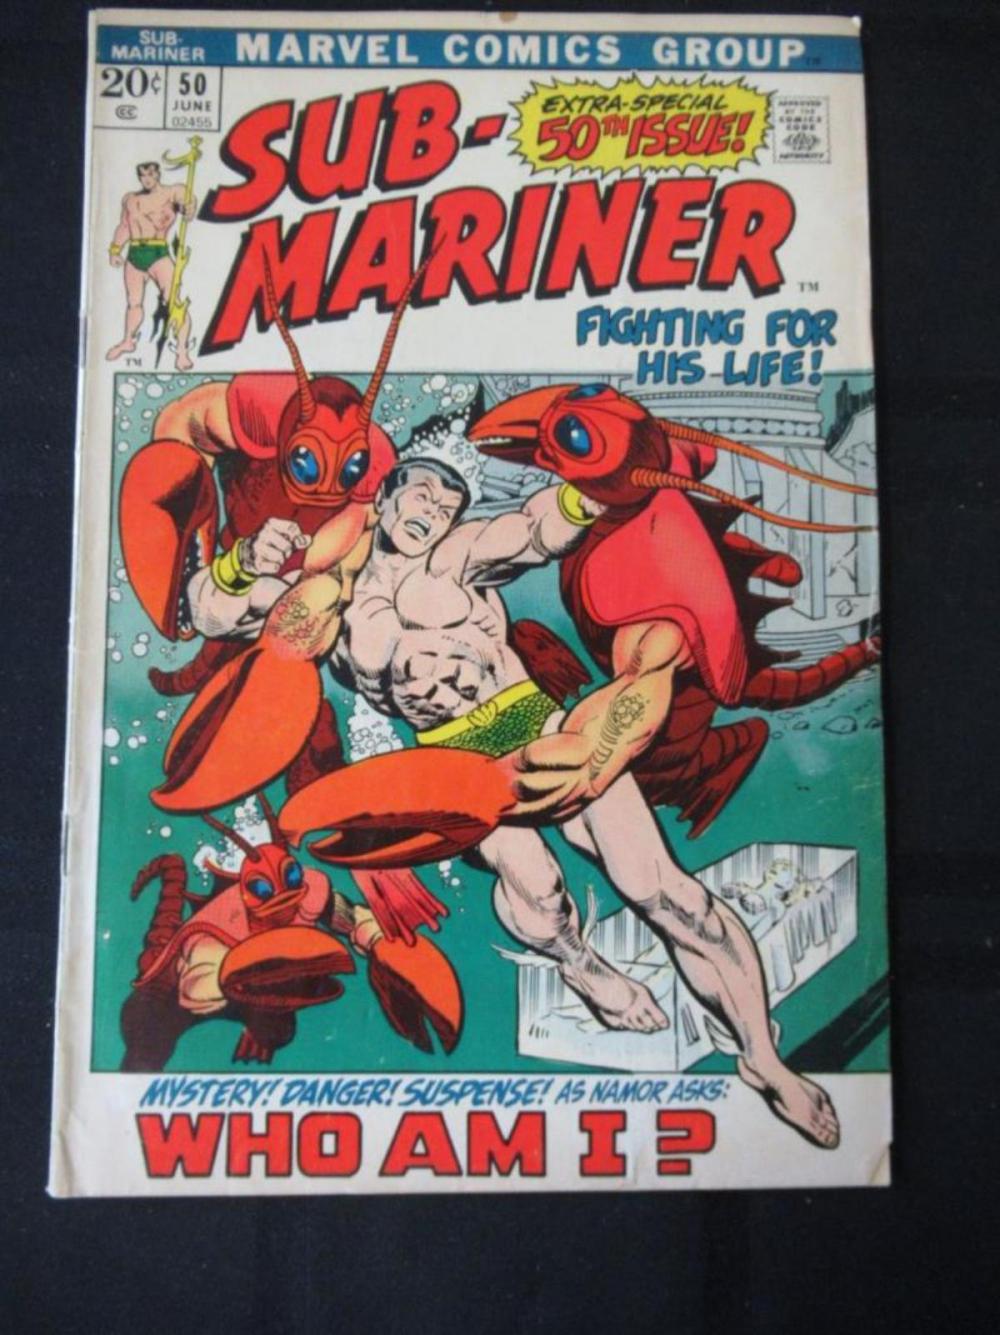 Sub-Mariner 50th Special Issue 20c #50